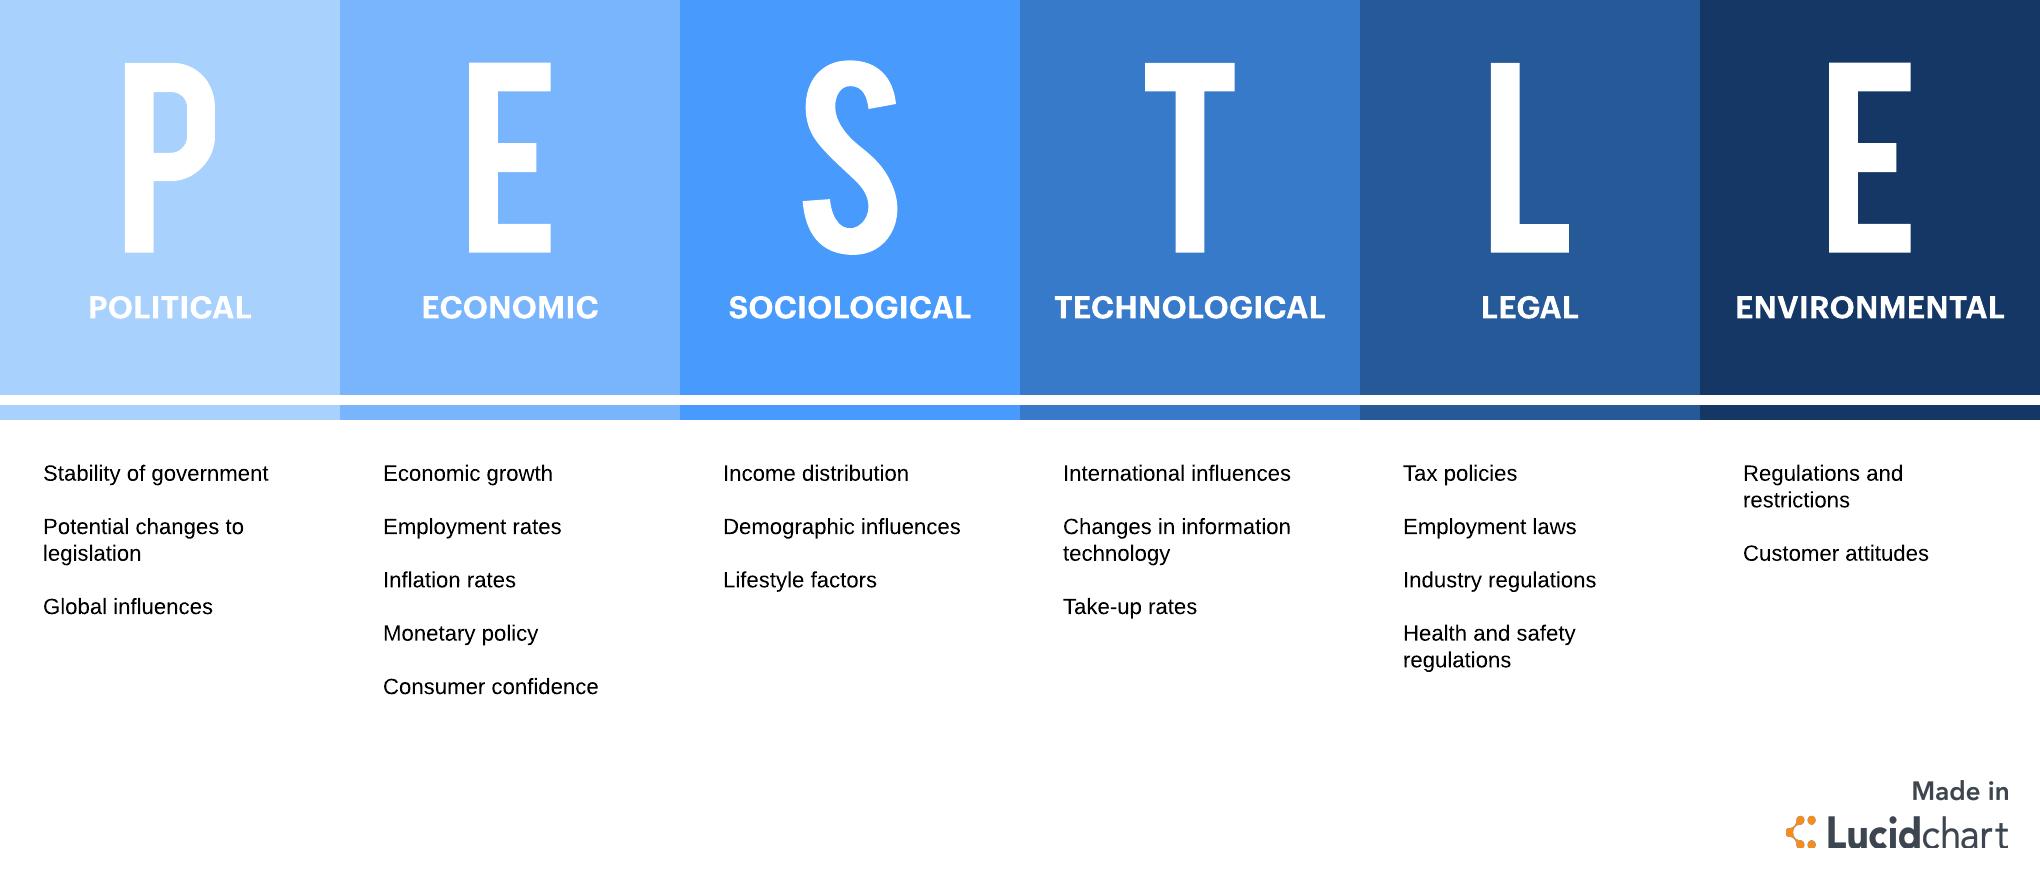 Strategic Planning Through PEST Analysis.